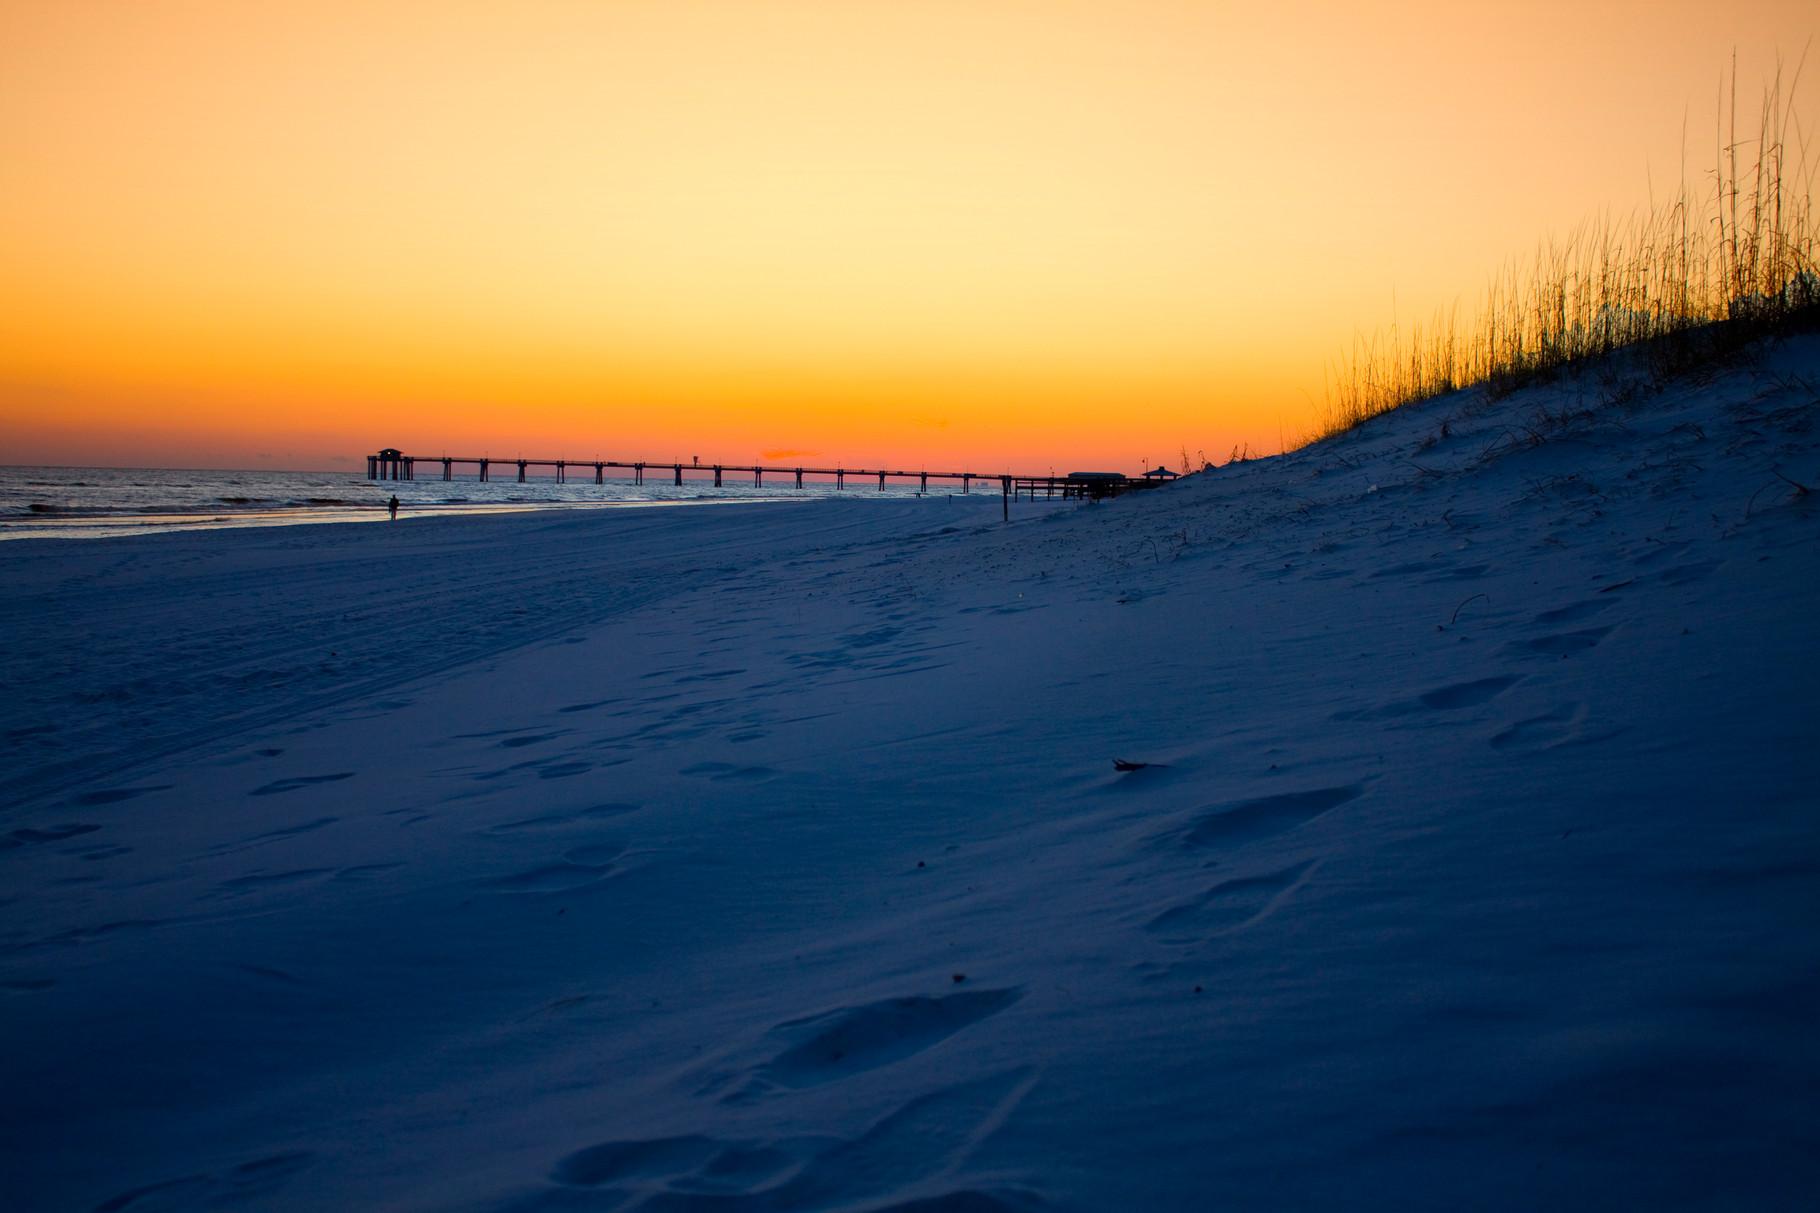 02_Fort Walton Beach in Florida